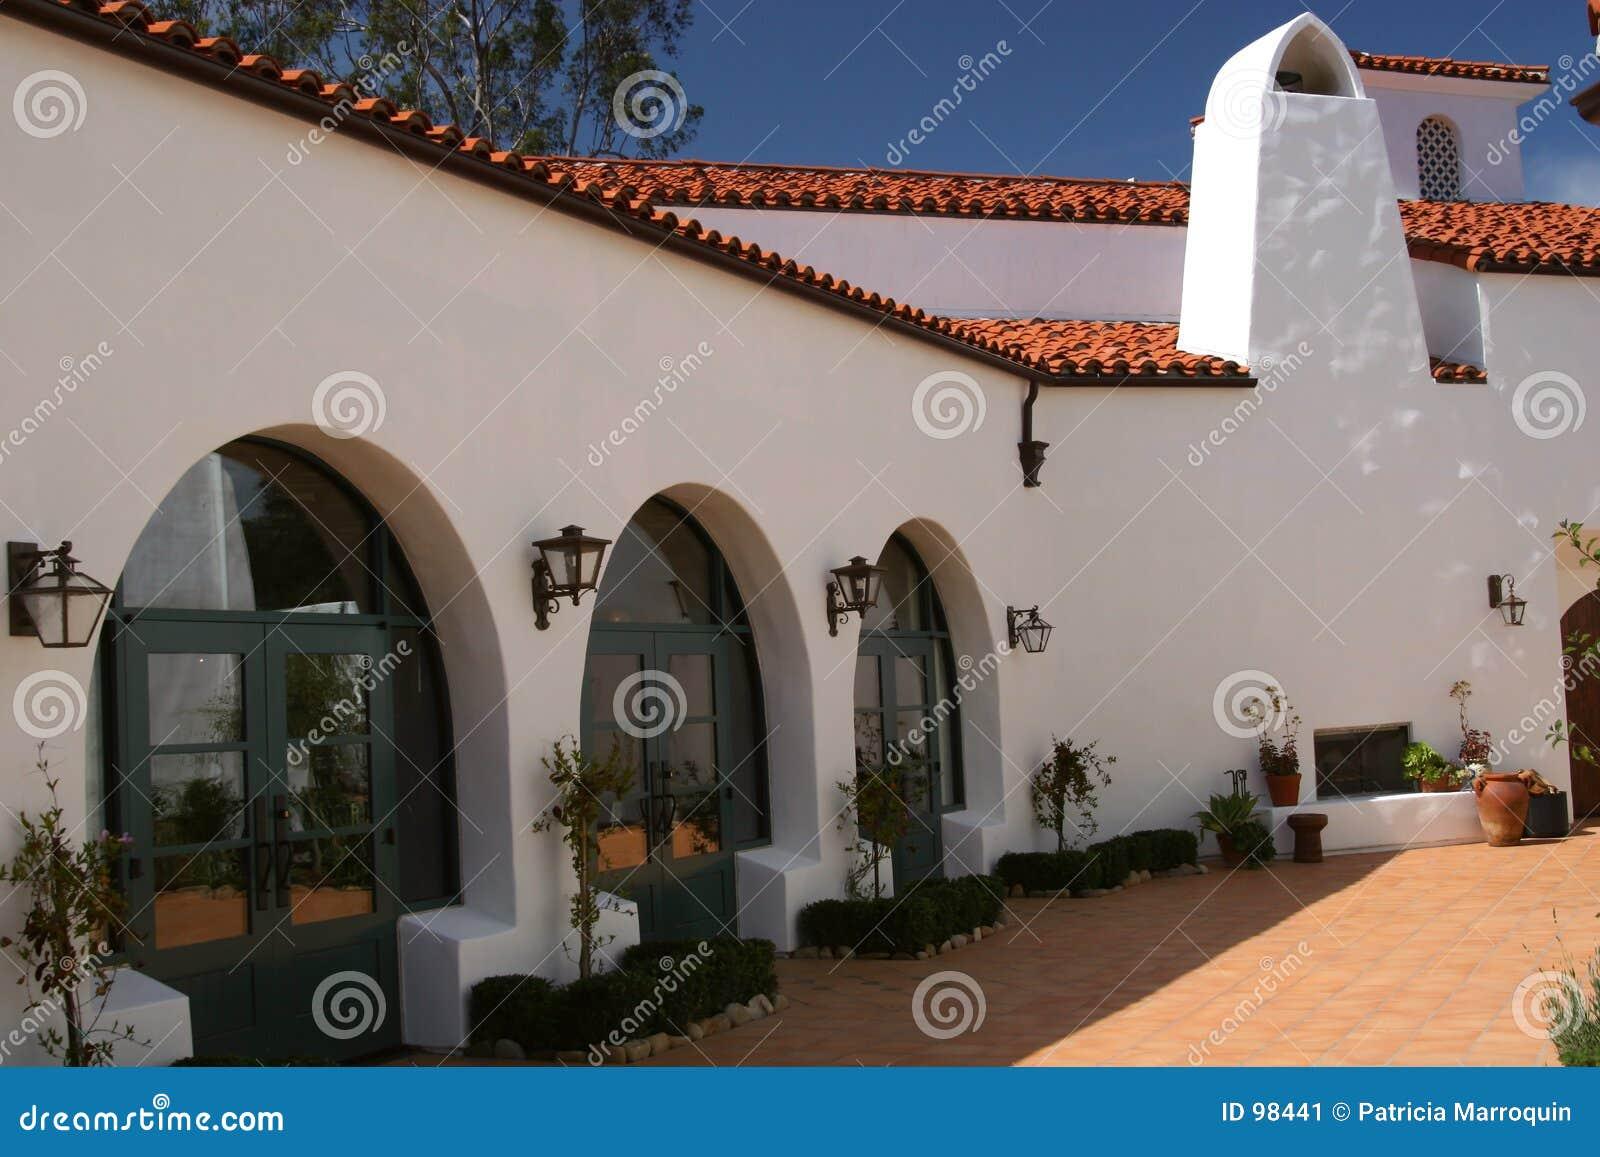 Classic Spanish Architecture Stock Image - Image: 98441